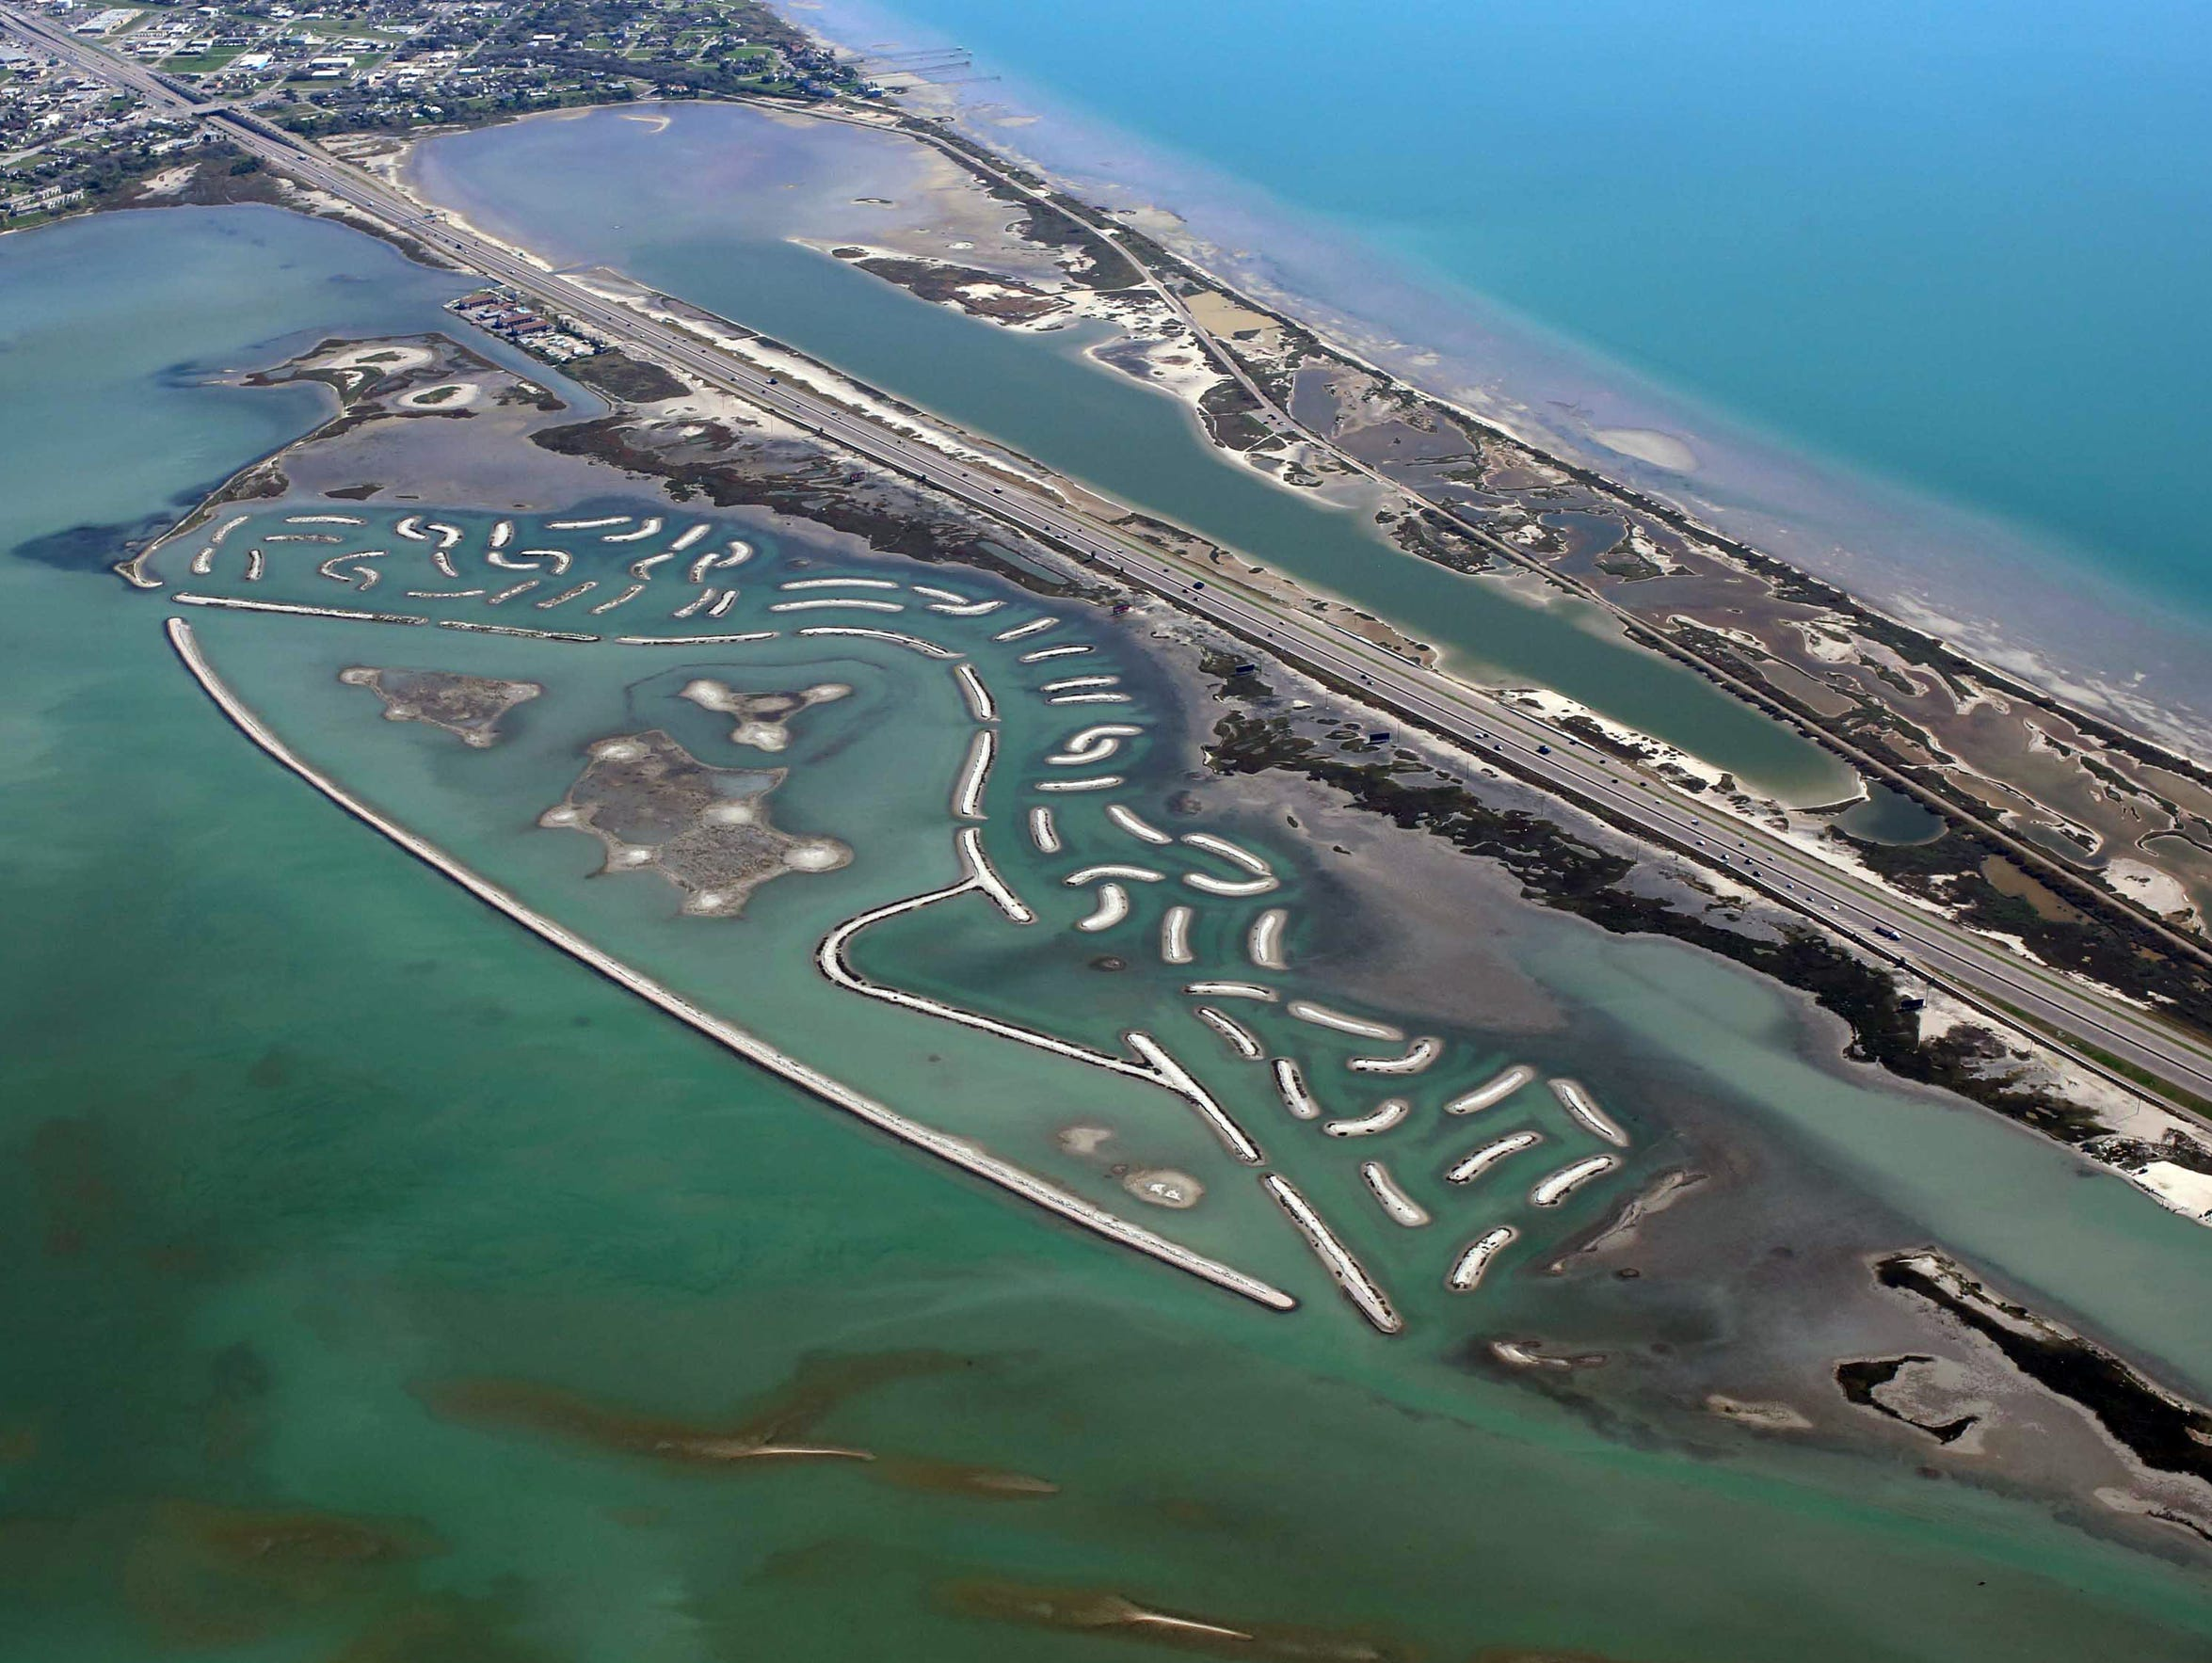 The Coastal Bend Bays & Estuaries Program created a